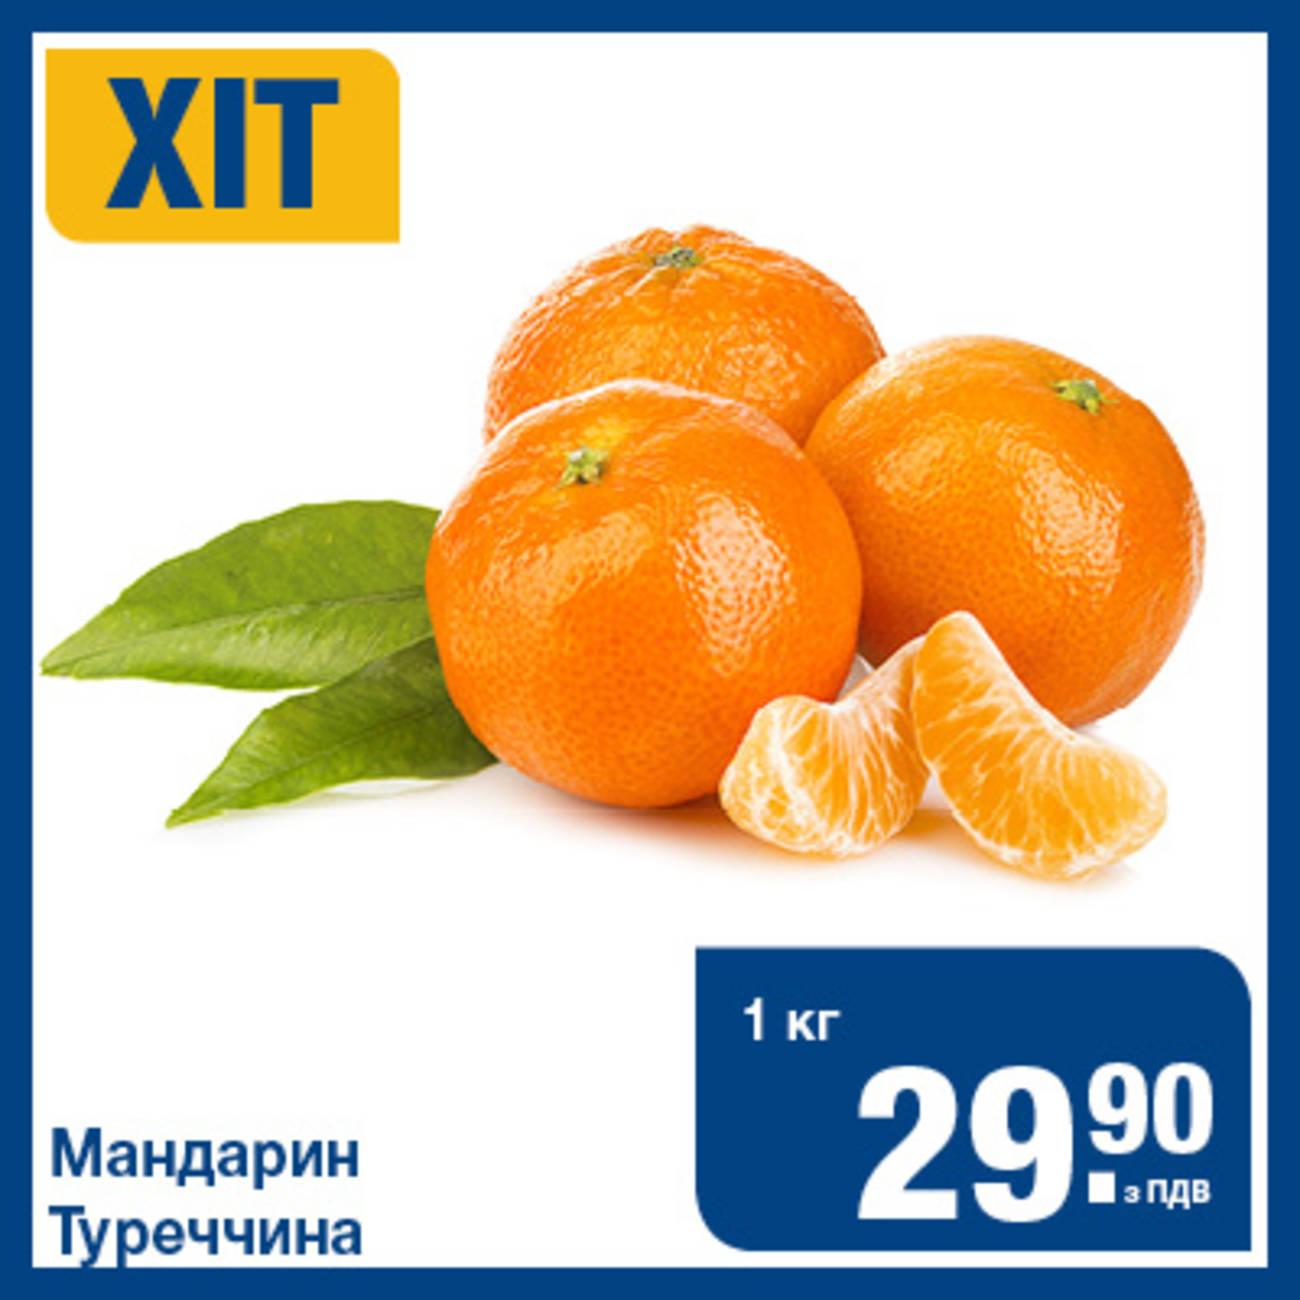 займ экспресс мандарина